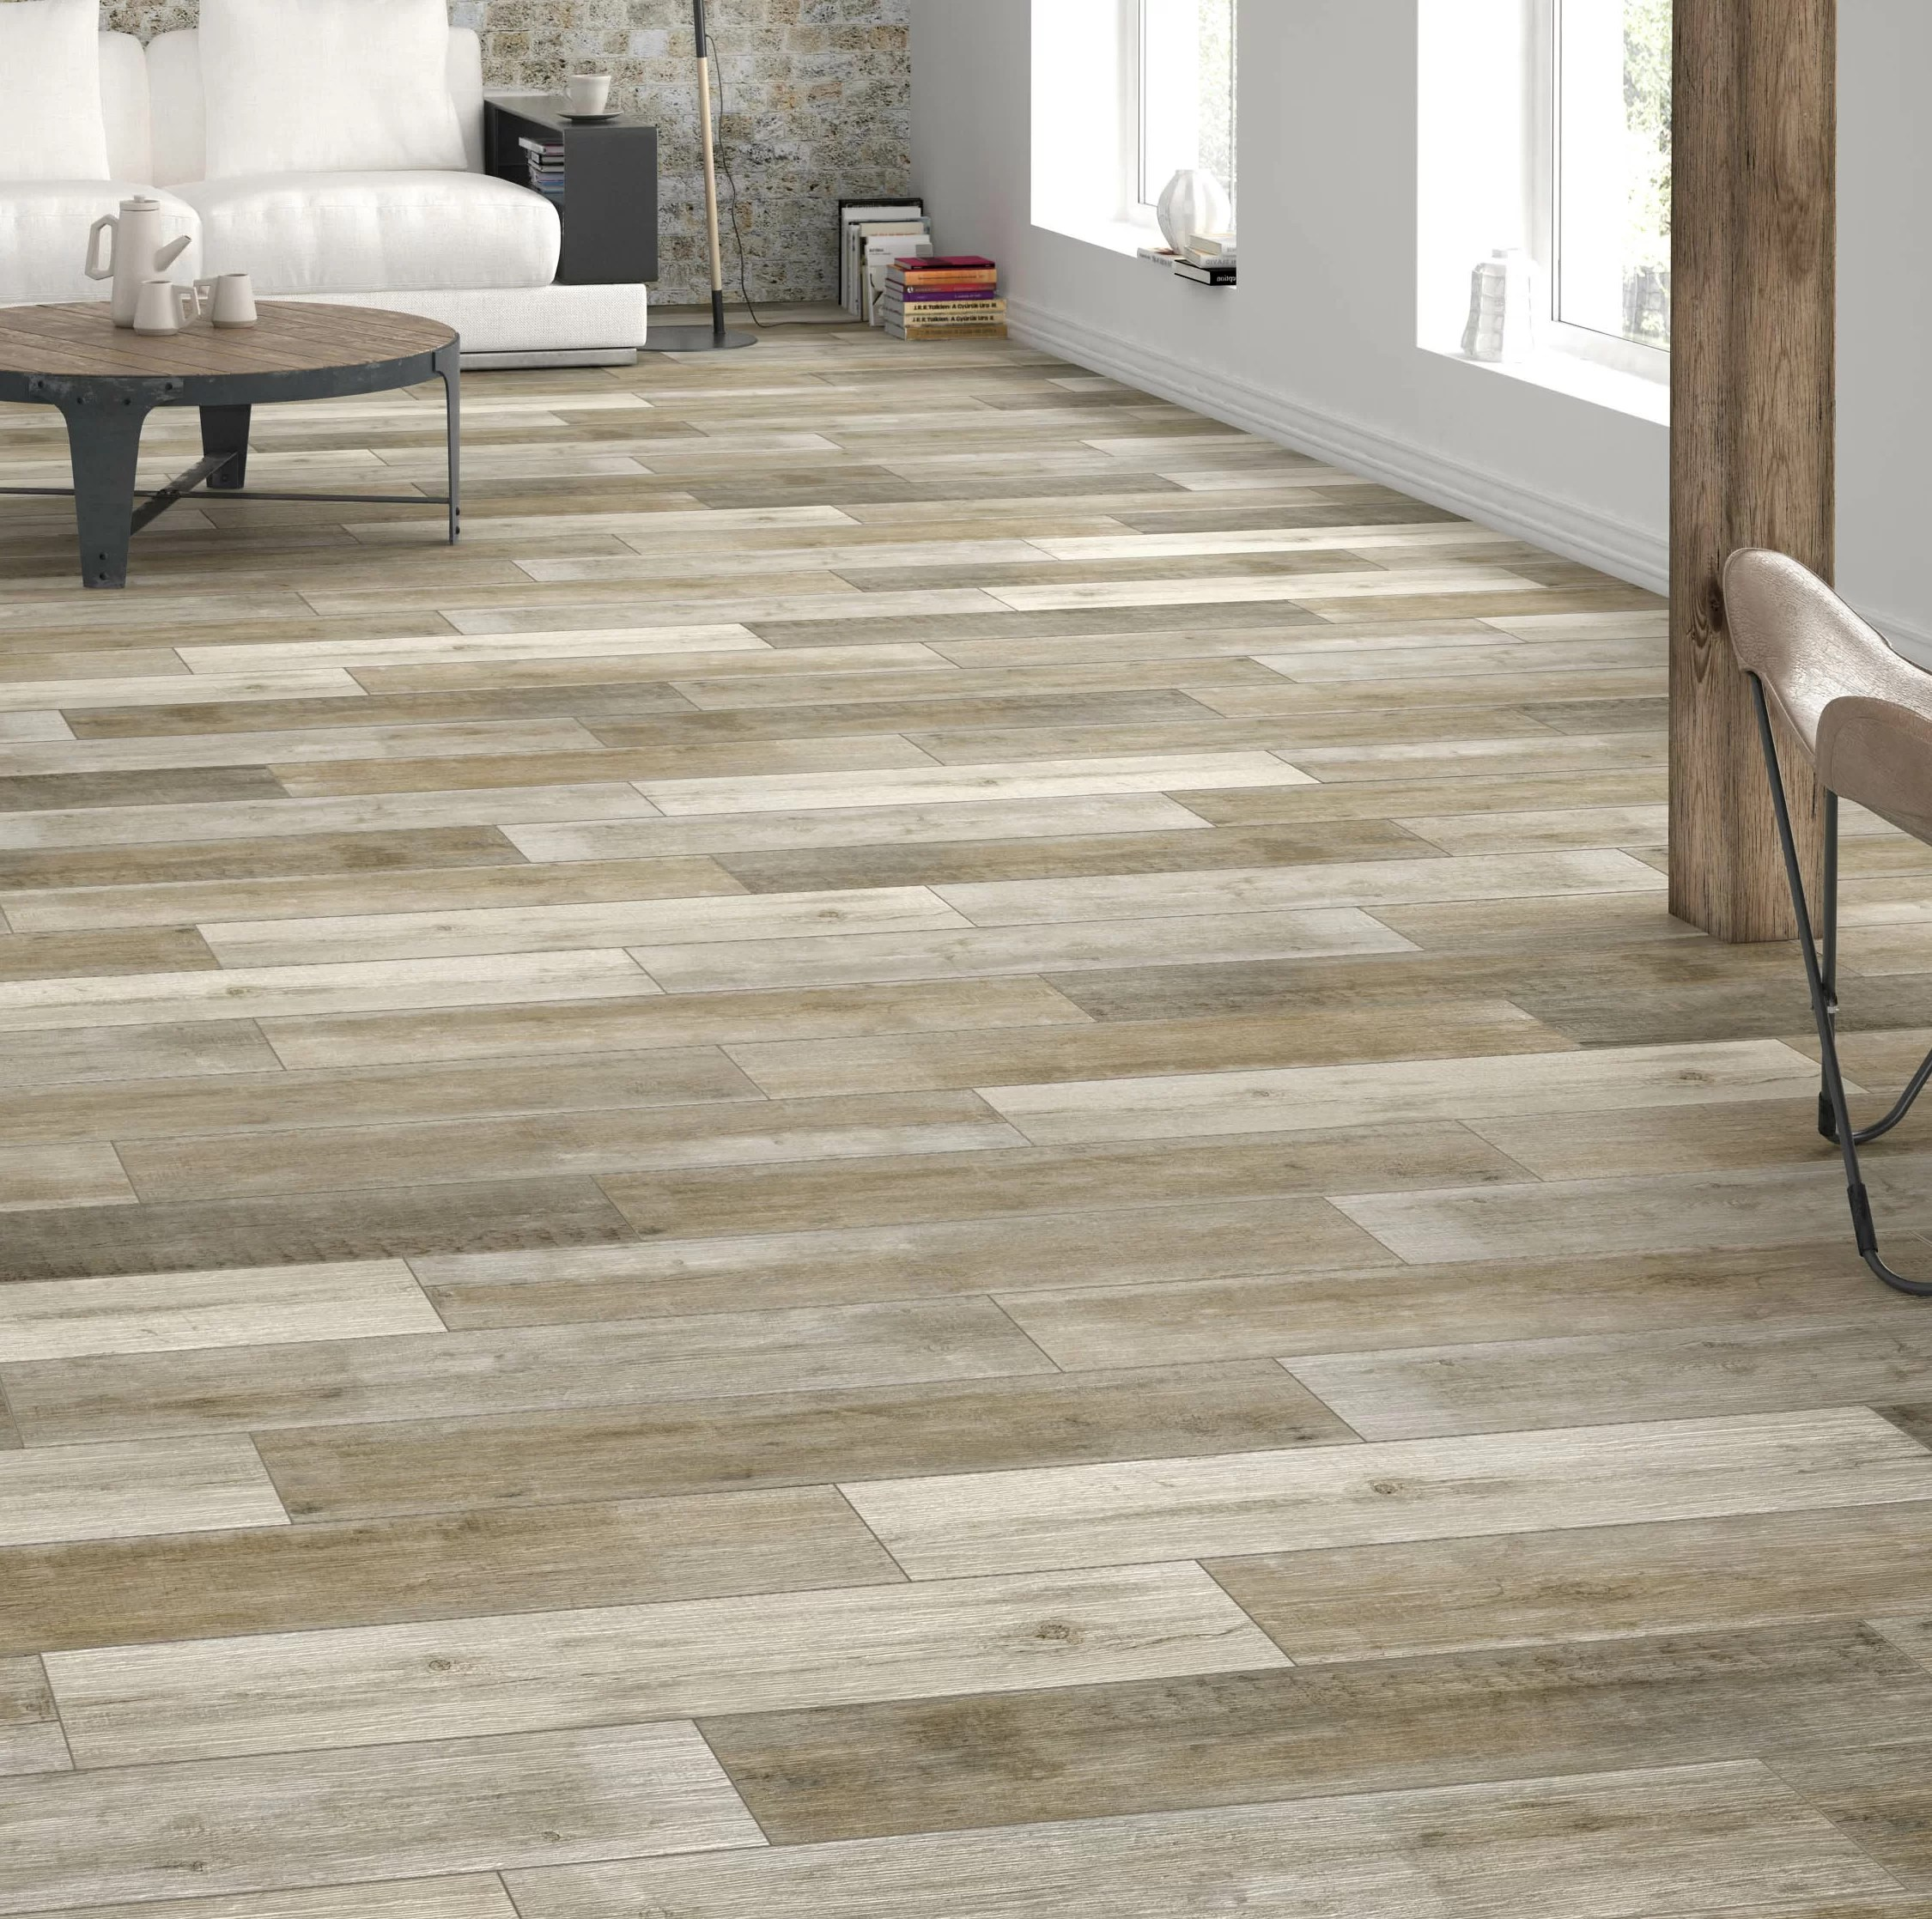 unde 6 x 36 porcelain wood look wall floor tile